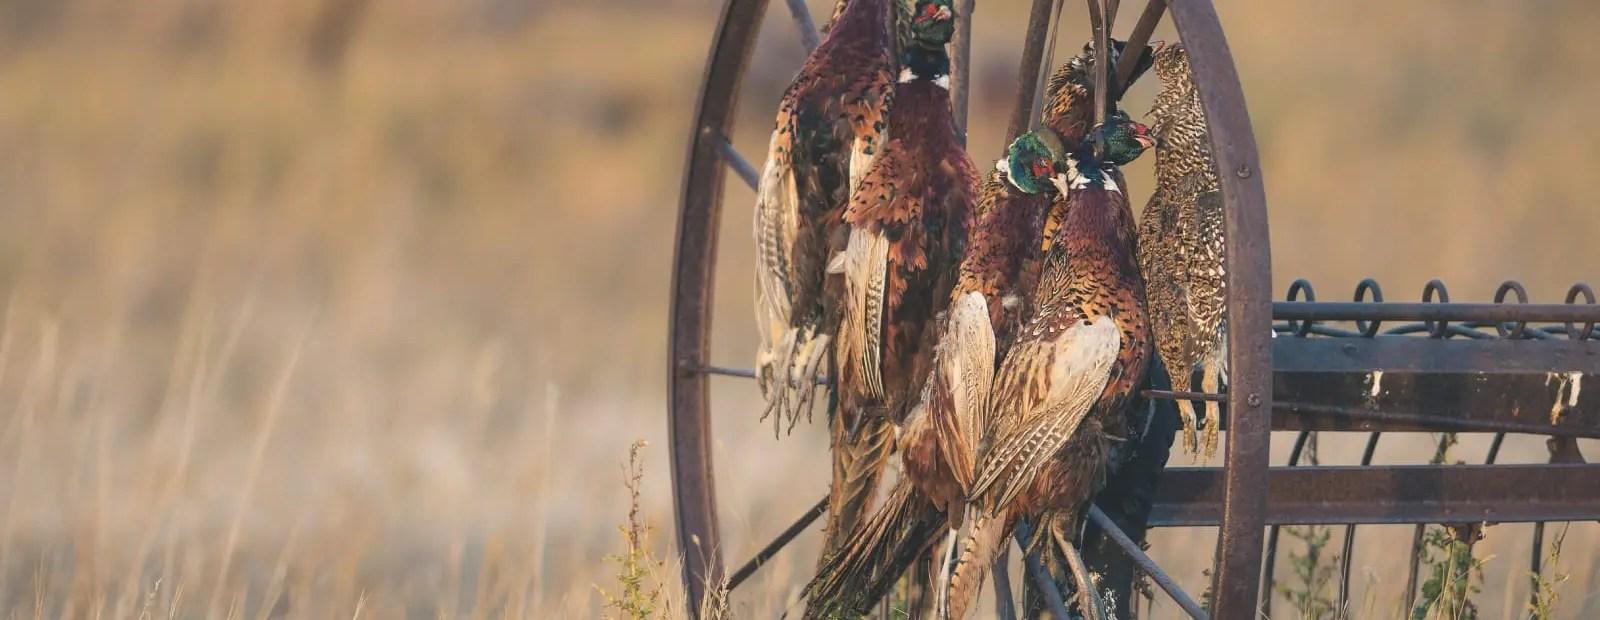 National Upland bird hunting survey